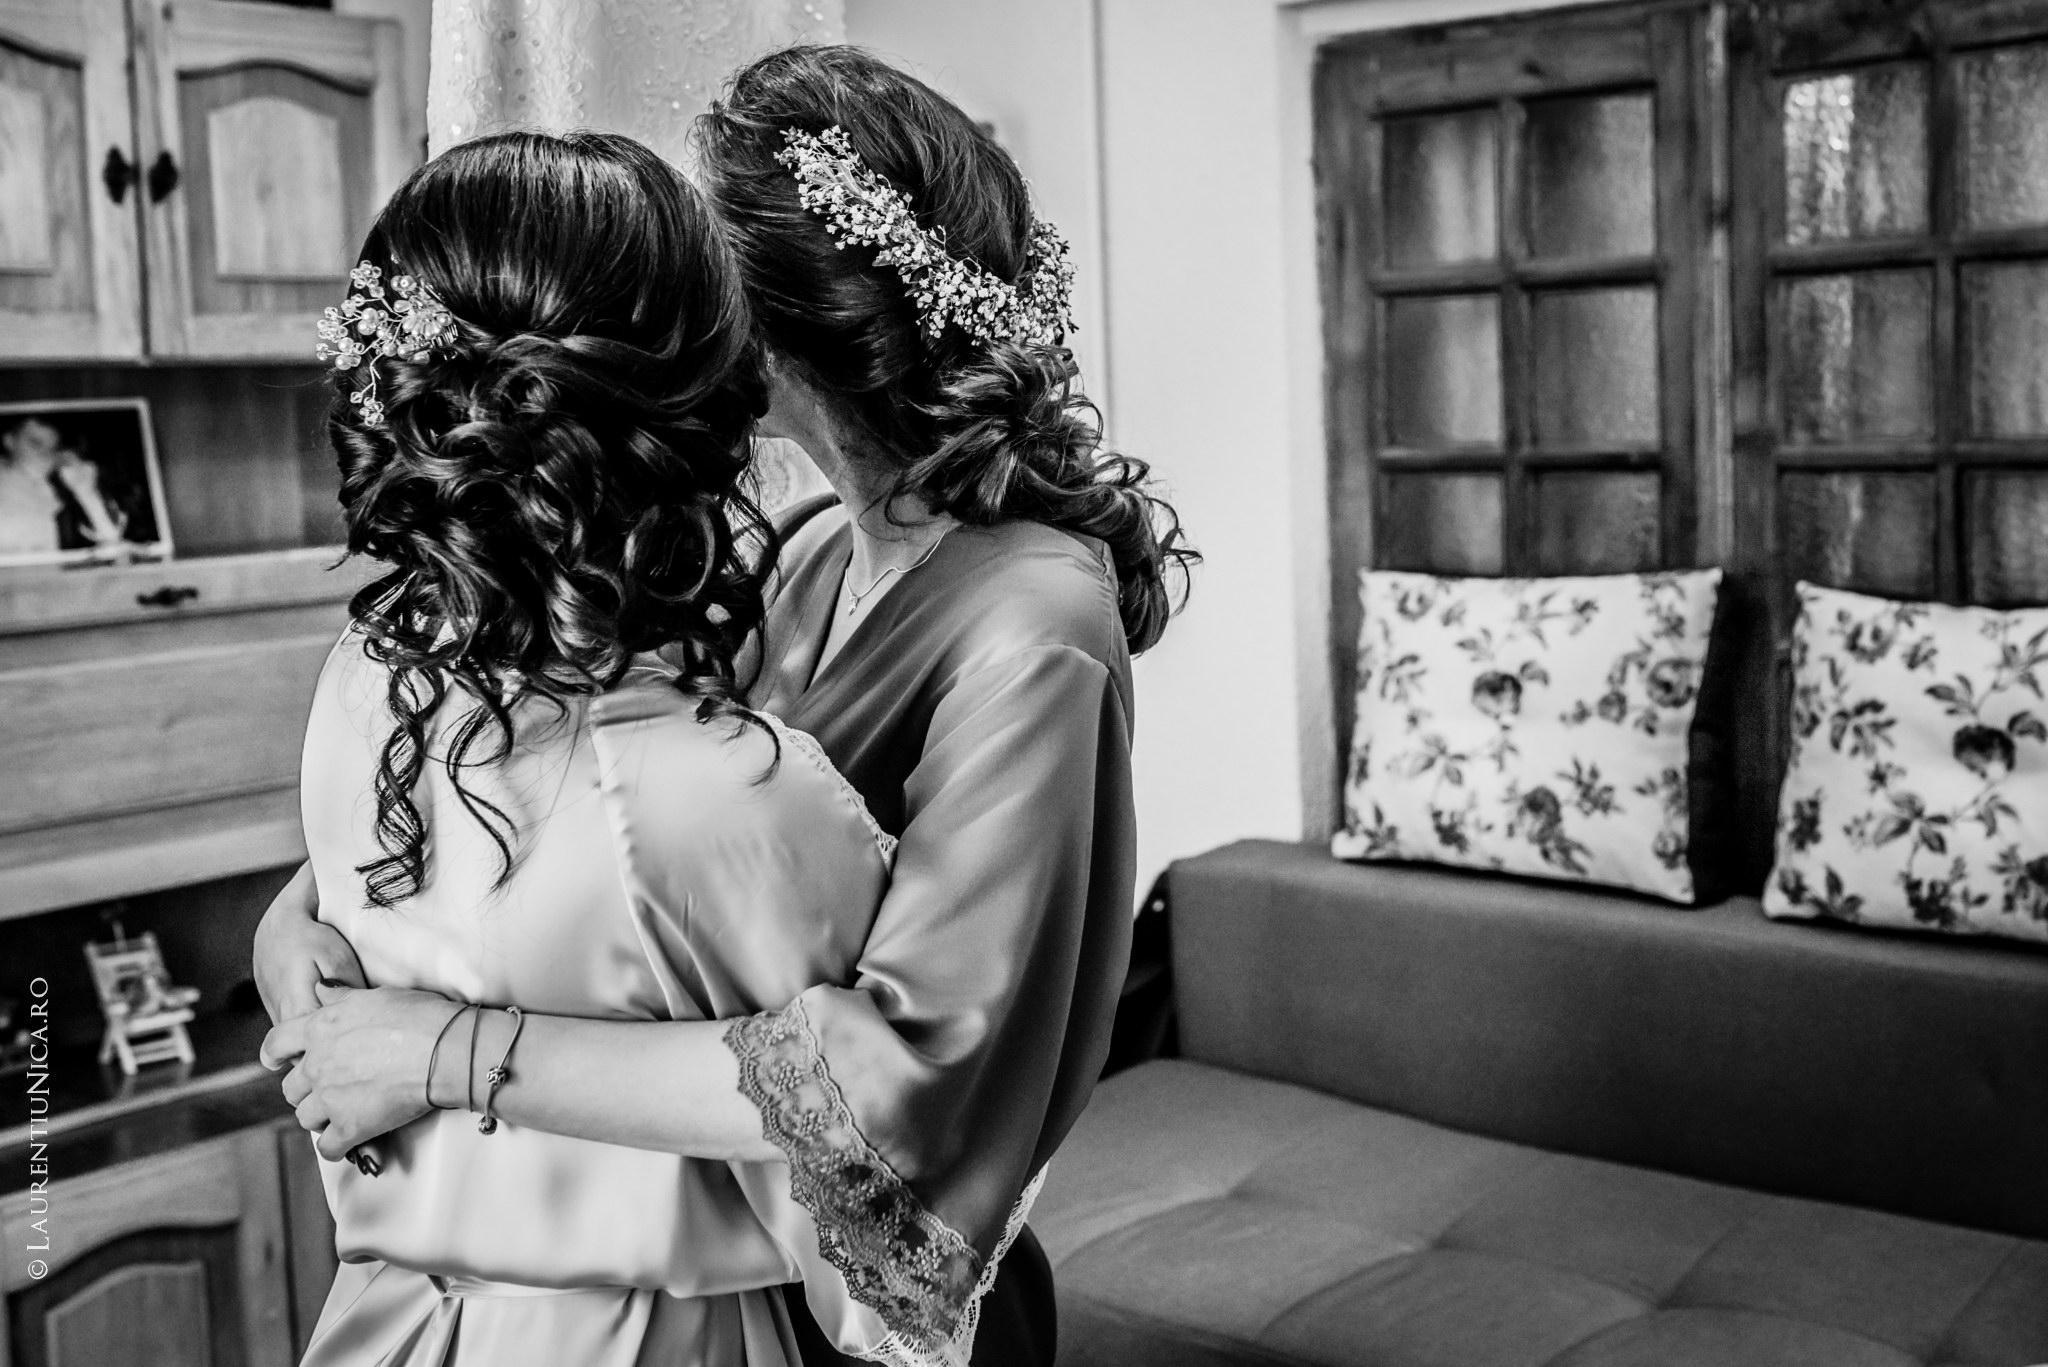 fotografii nunta craiova bia alex fotograf nunta laurentiu nica 10 - Bia & Alex | Fotografii nunta | Craiova